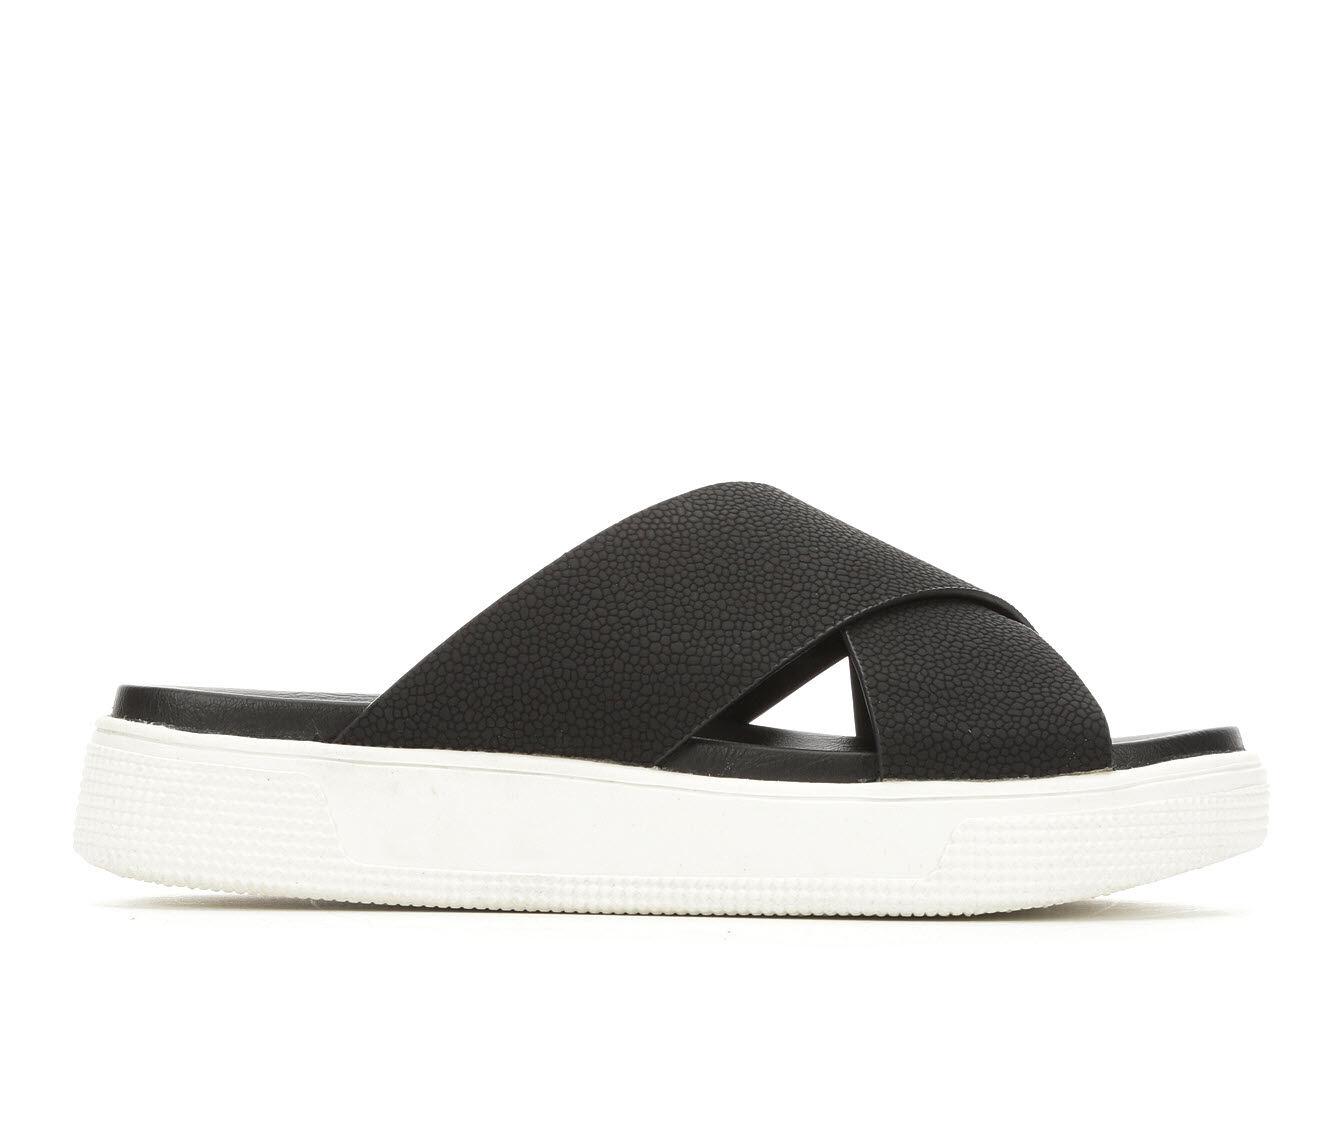 uk shoes_kd6569